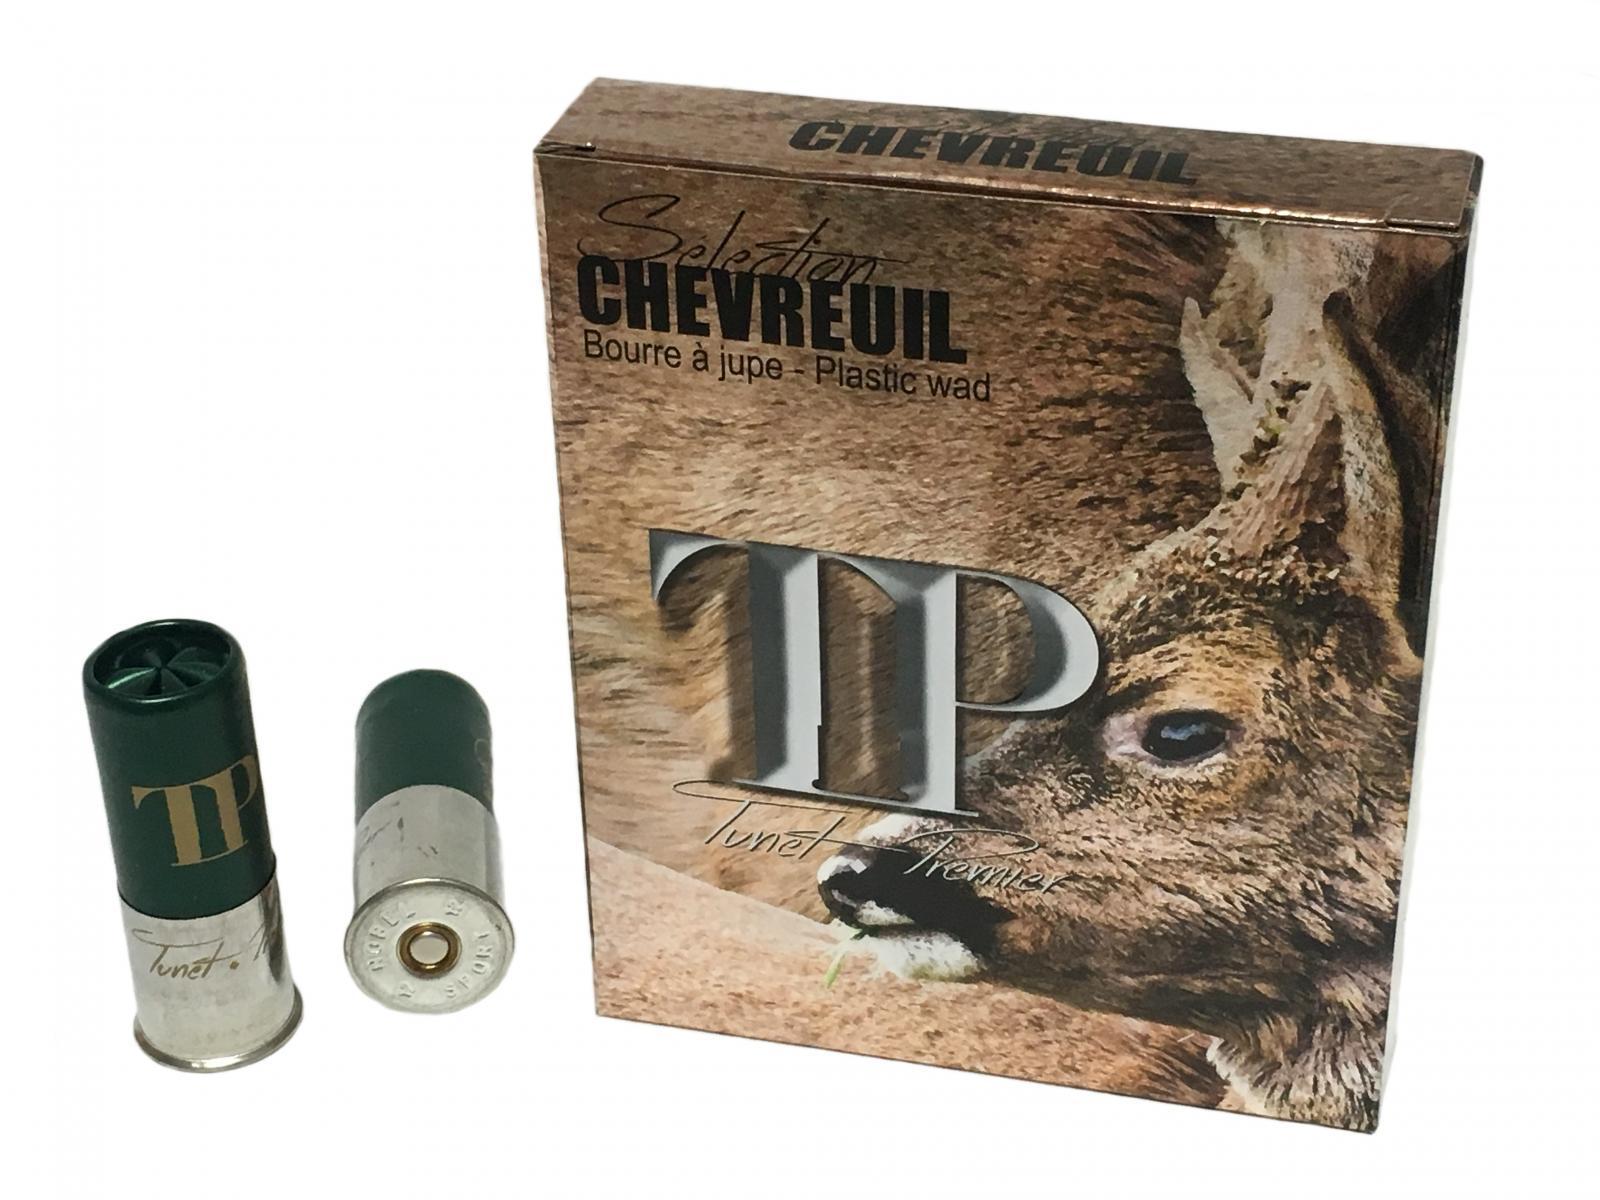 Boite de 10 cartouches calibre 12 / 70 SPECIAL CHEVREUIL TCHEV